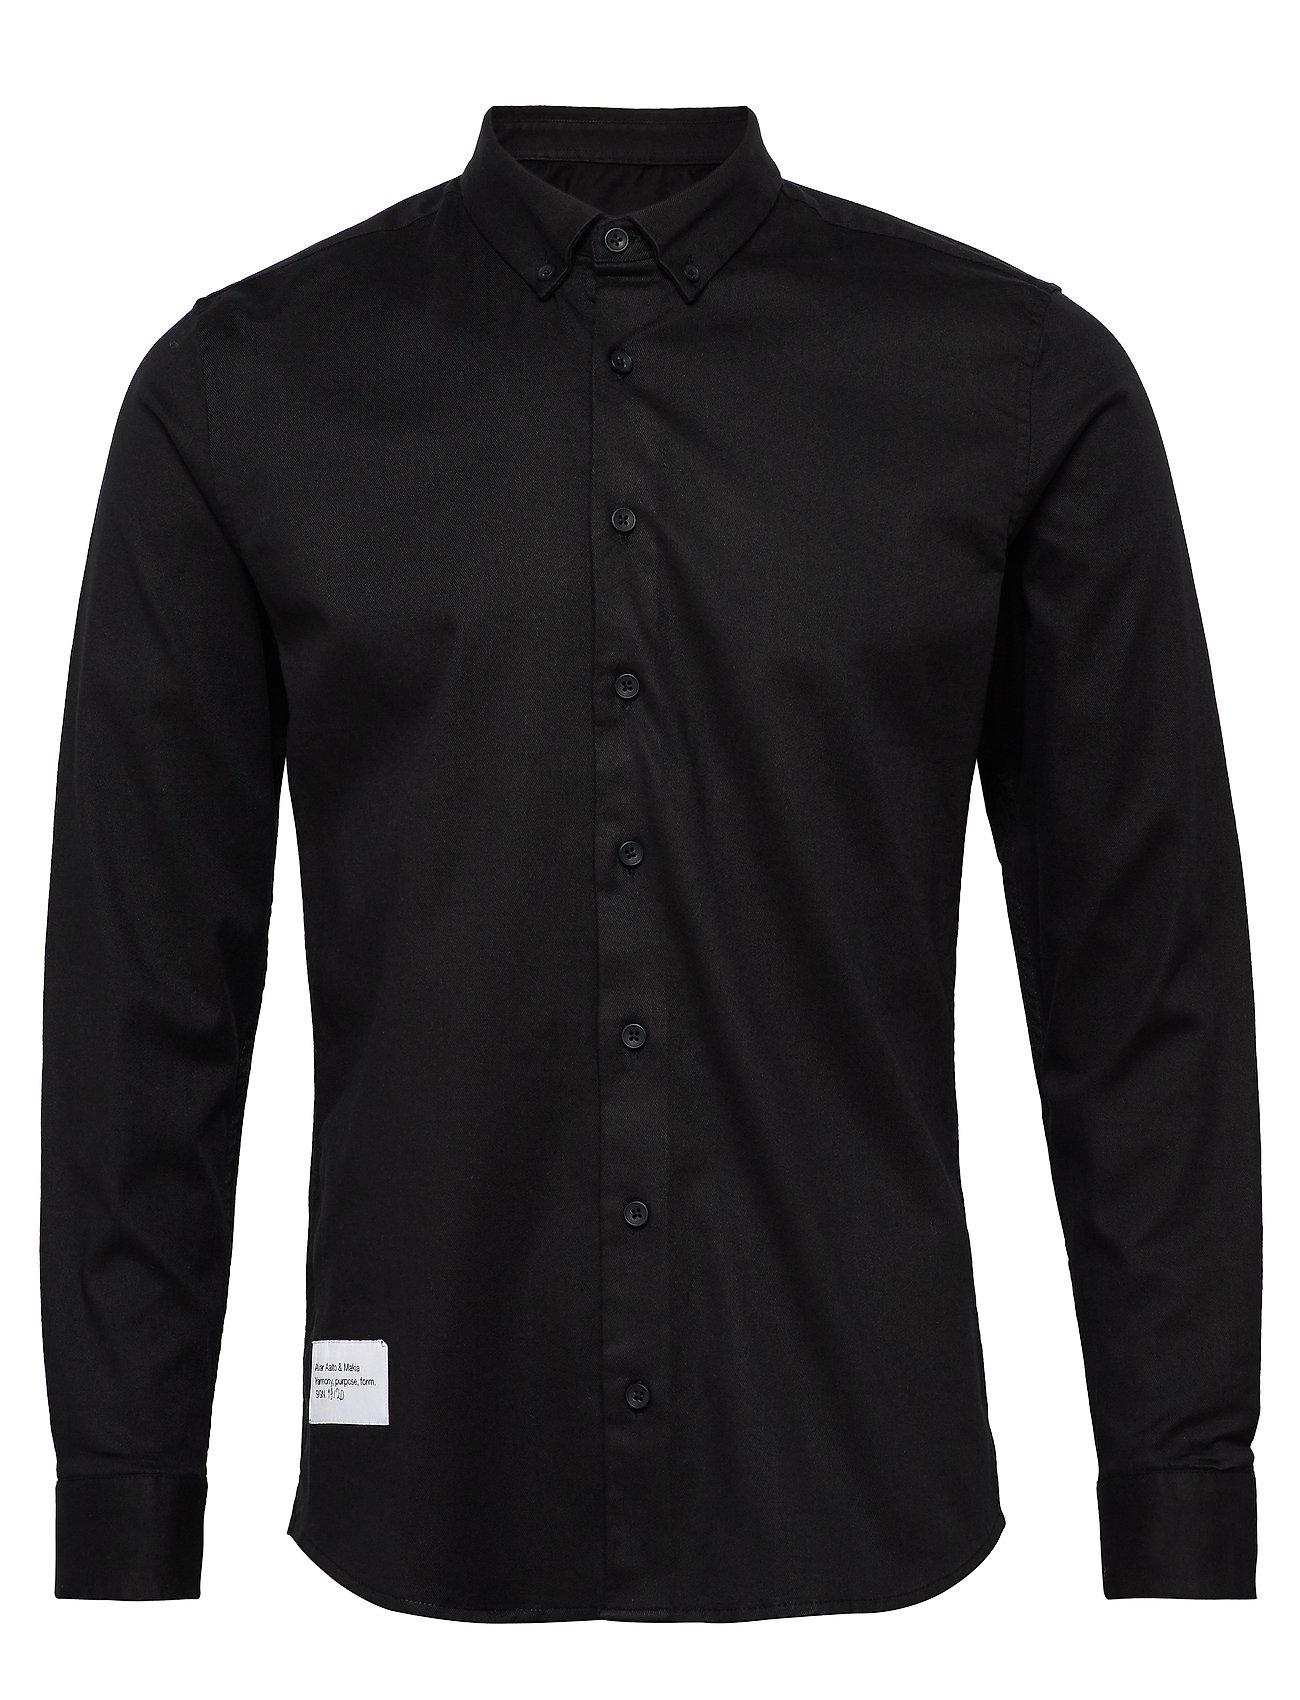 Makia Architect Shirt - BLACK